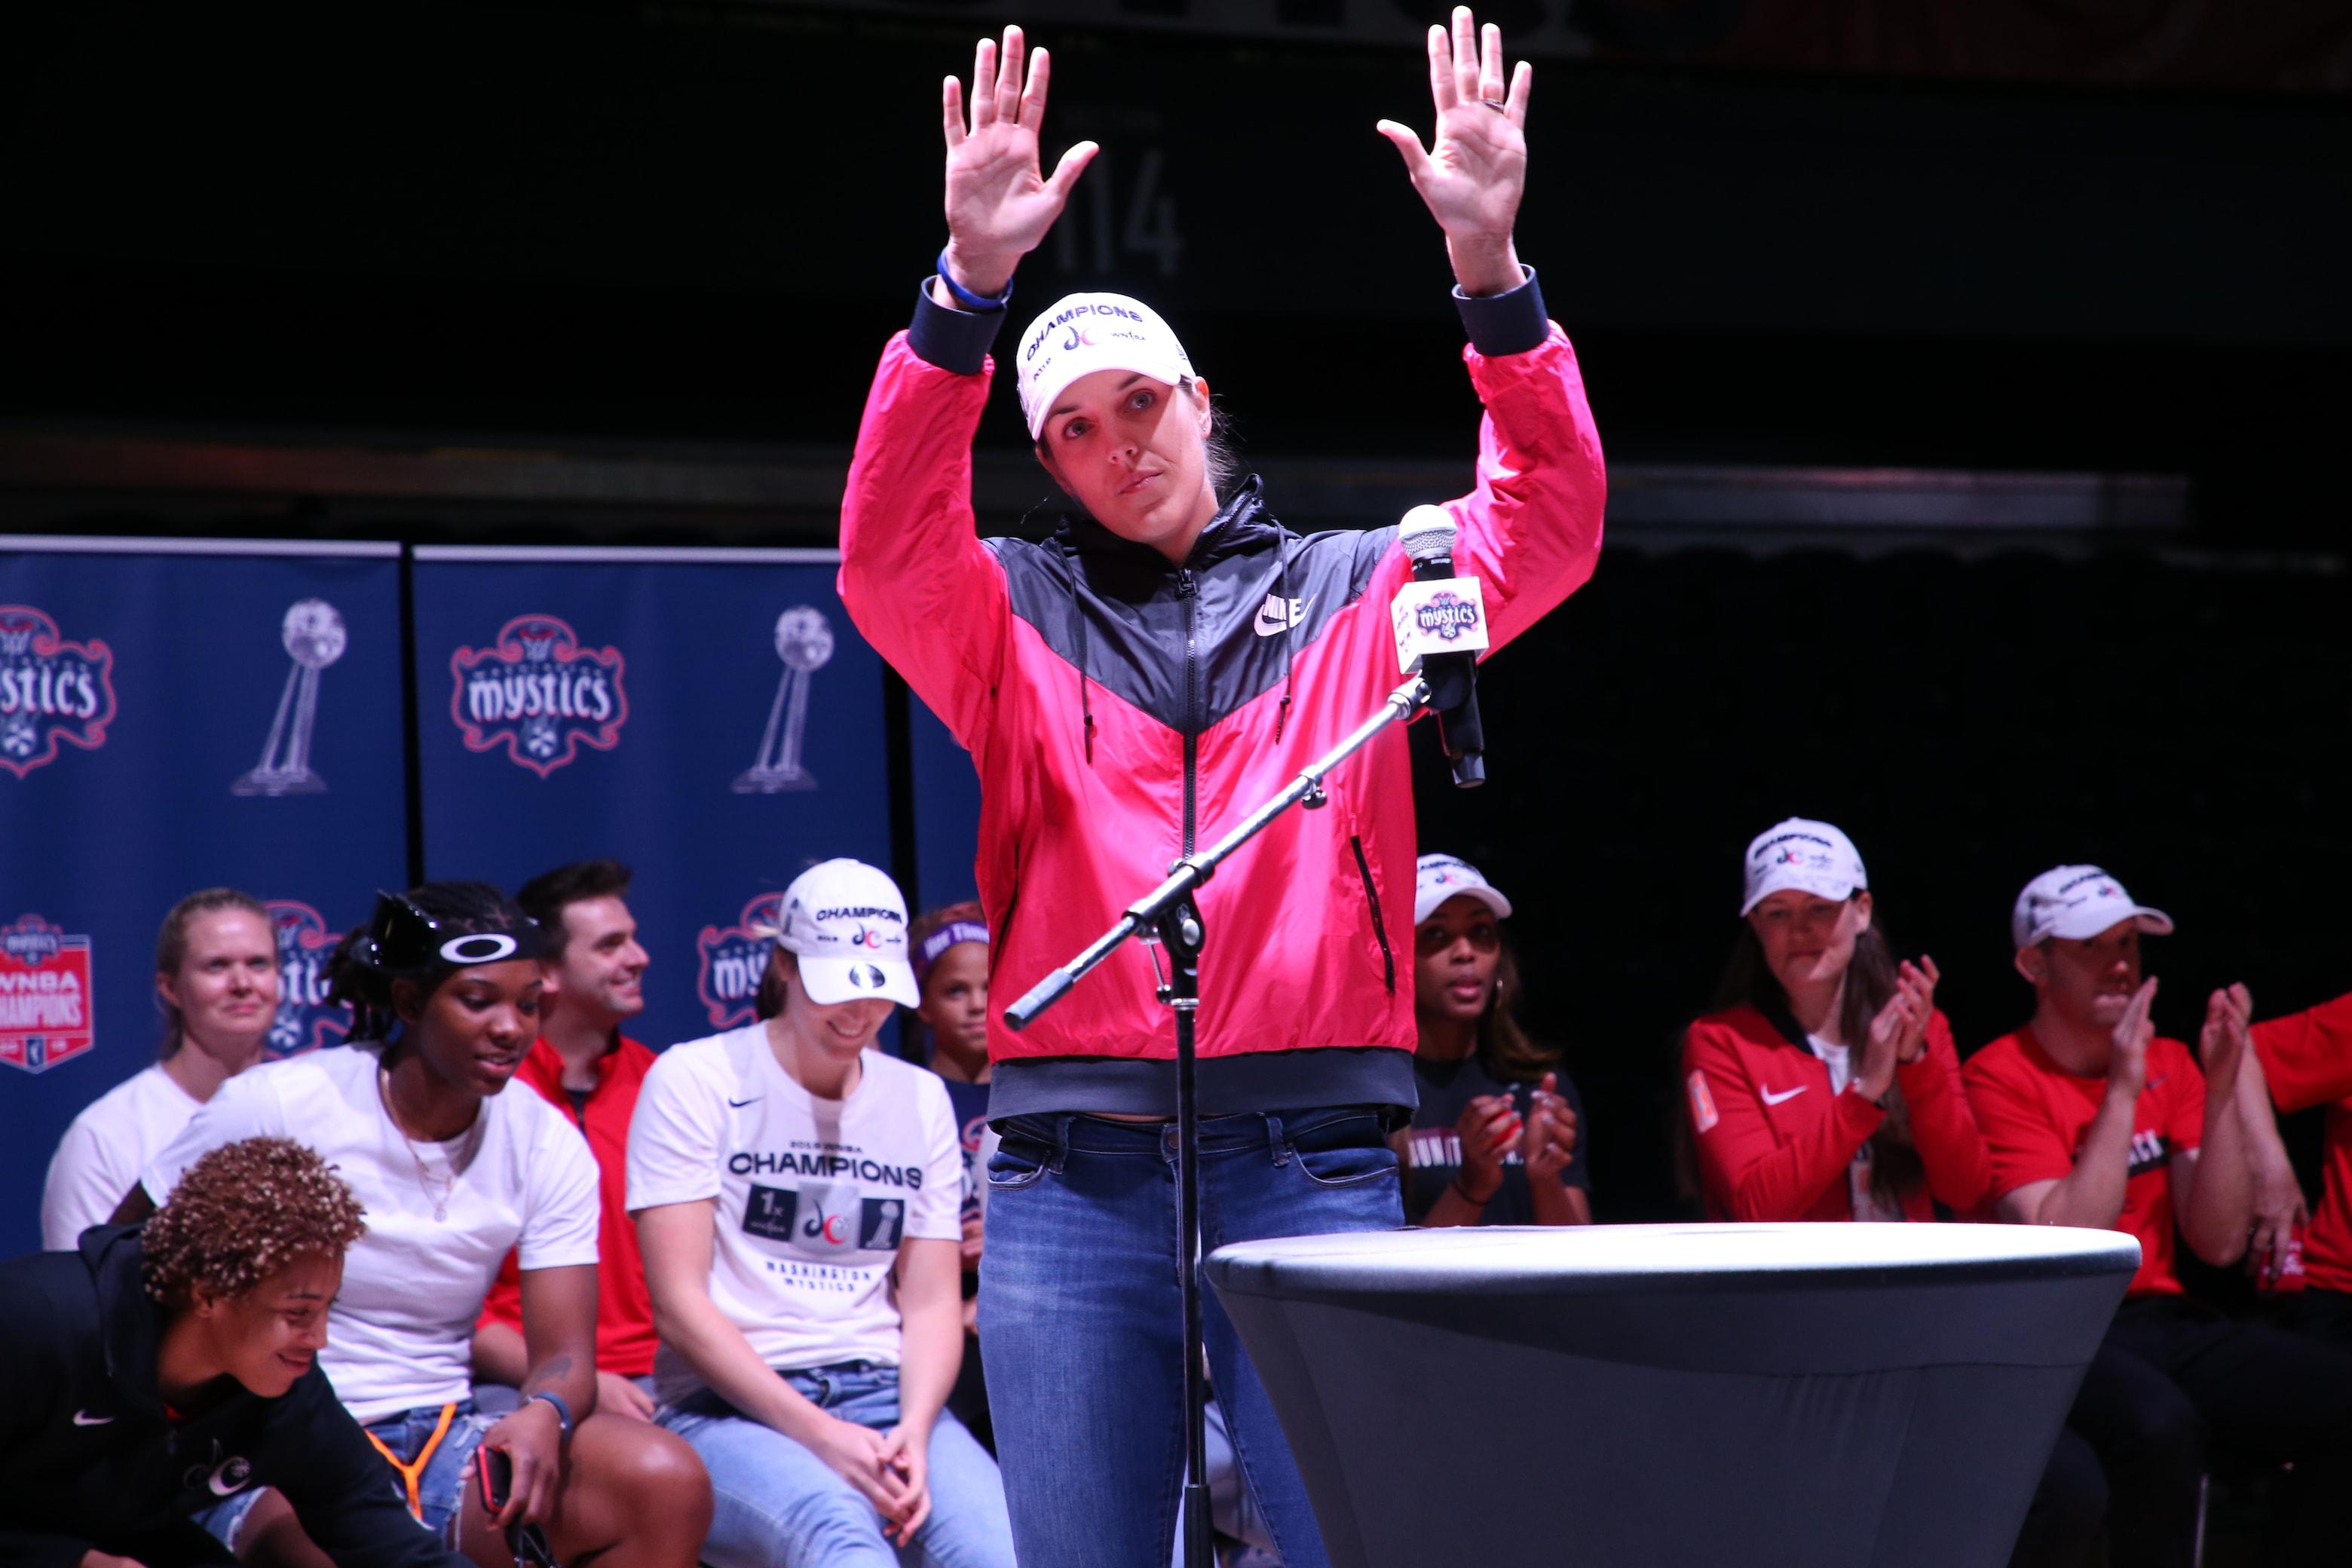 Elena Delle Donne thanks Mystics' fans at the Mystics' rally.